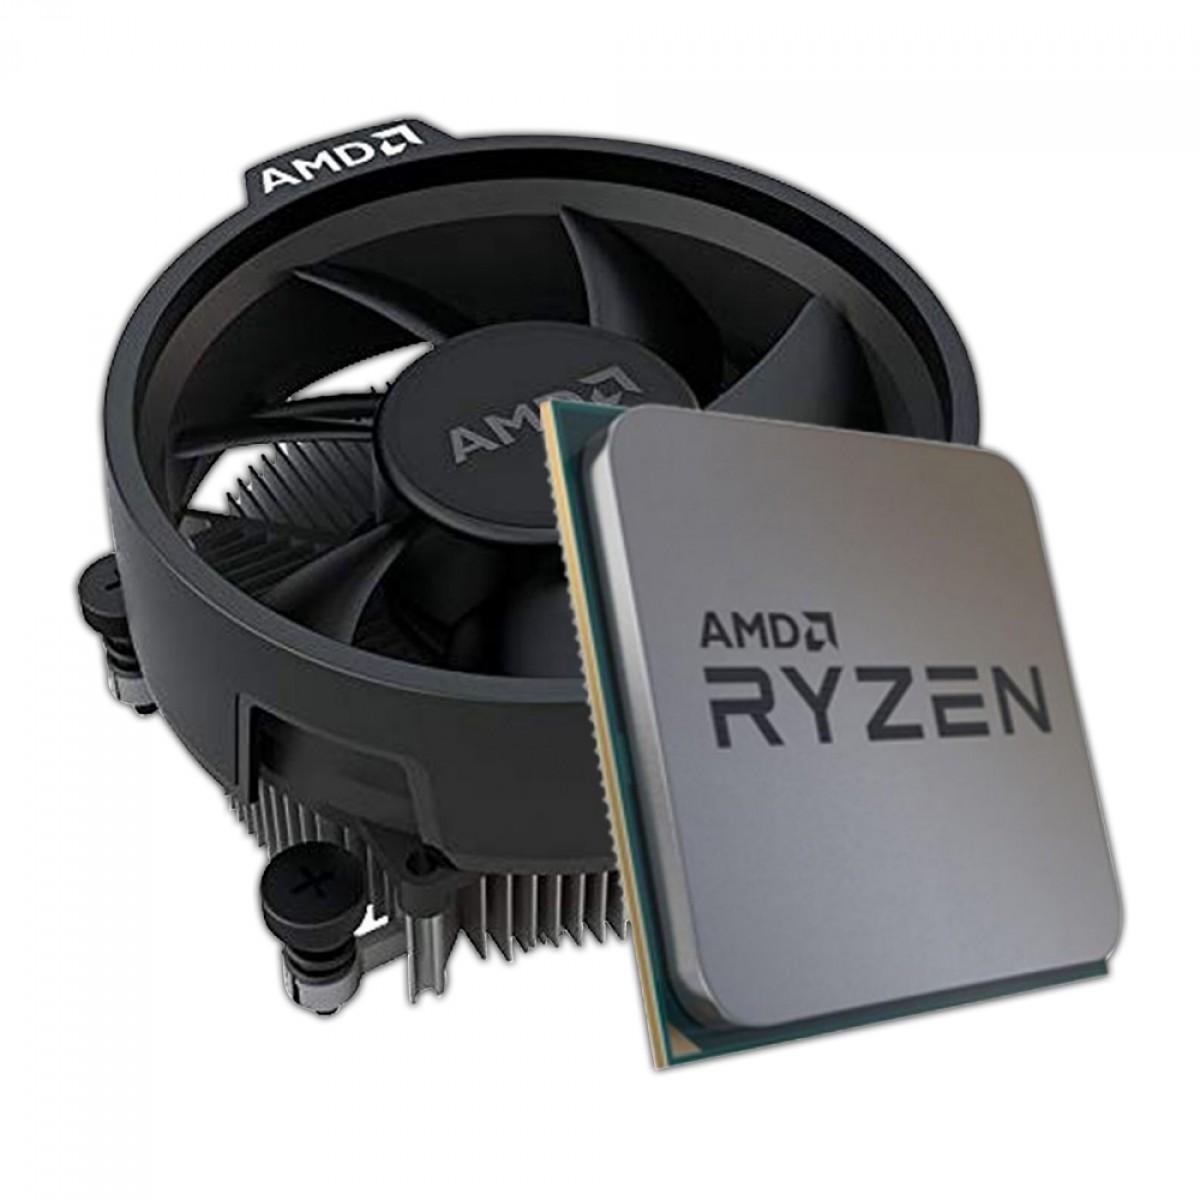 Kit Upgrade Gigabyte B450M Gaming + AMD Ryzen 5 3400G 3.7GHz + Geil Evo Potenza DDR4 16GB (2x8GB) 3000MHz